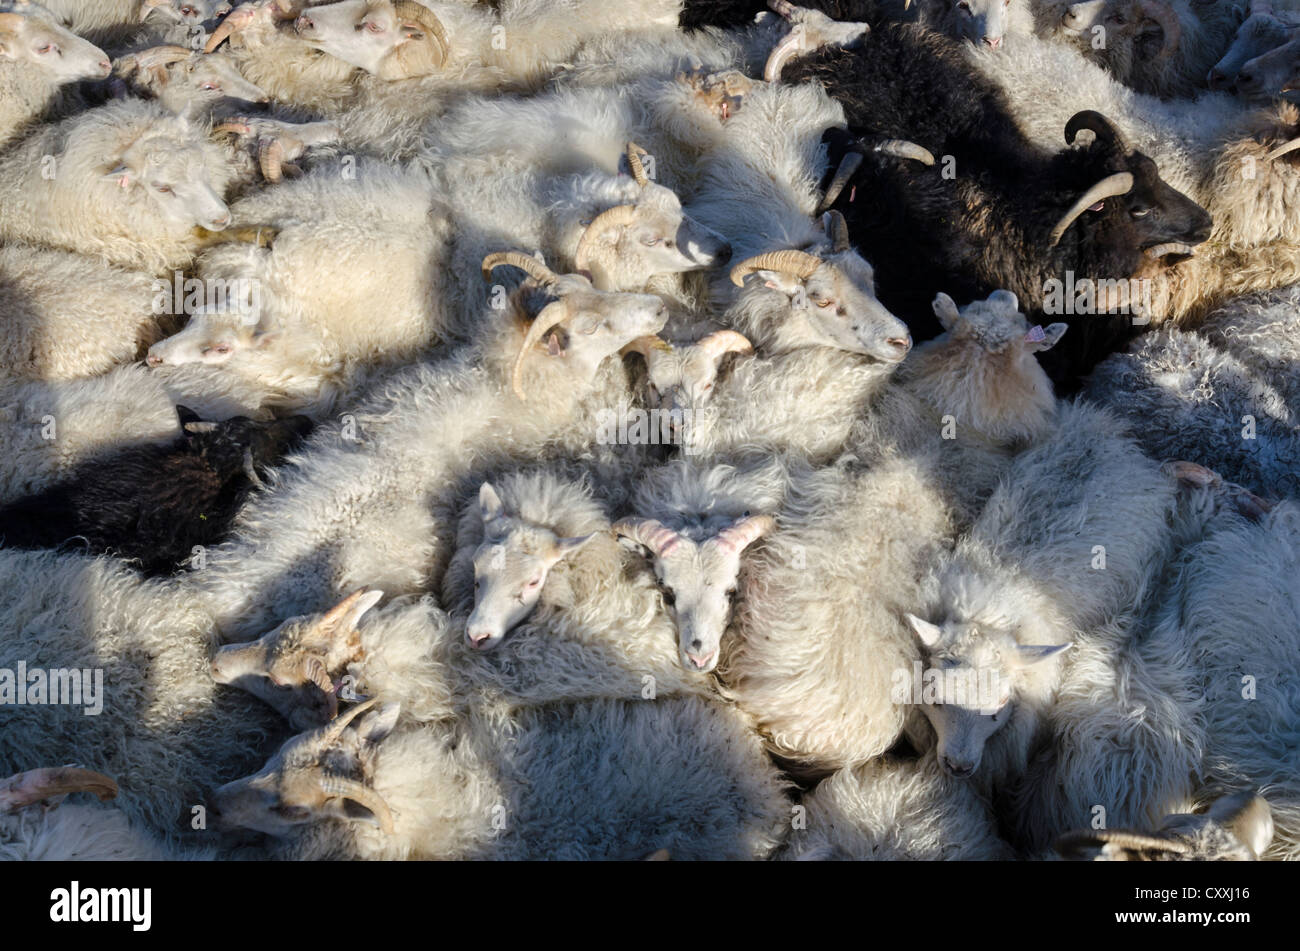 Black sheep among white sheep, flock of sheep near Kirkjubæjarklaustur, southern Iceland, Iceland, Europe - Stock Image